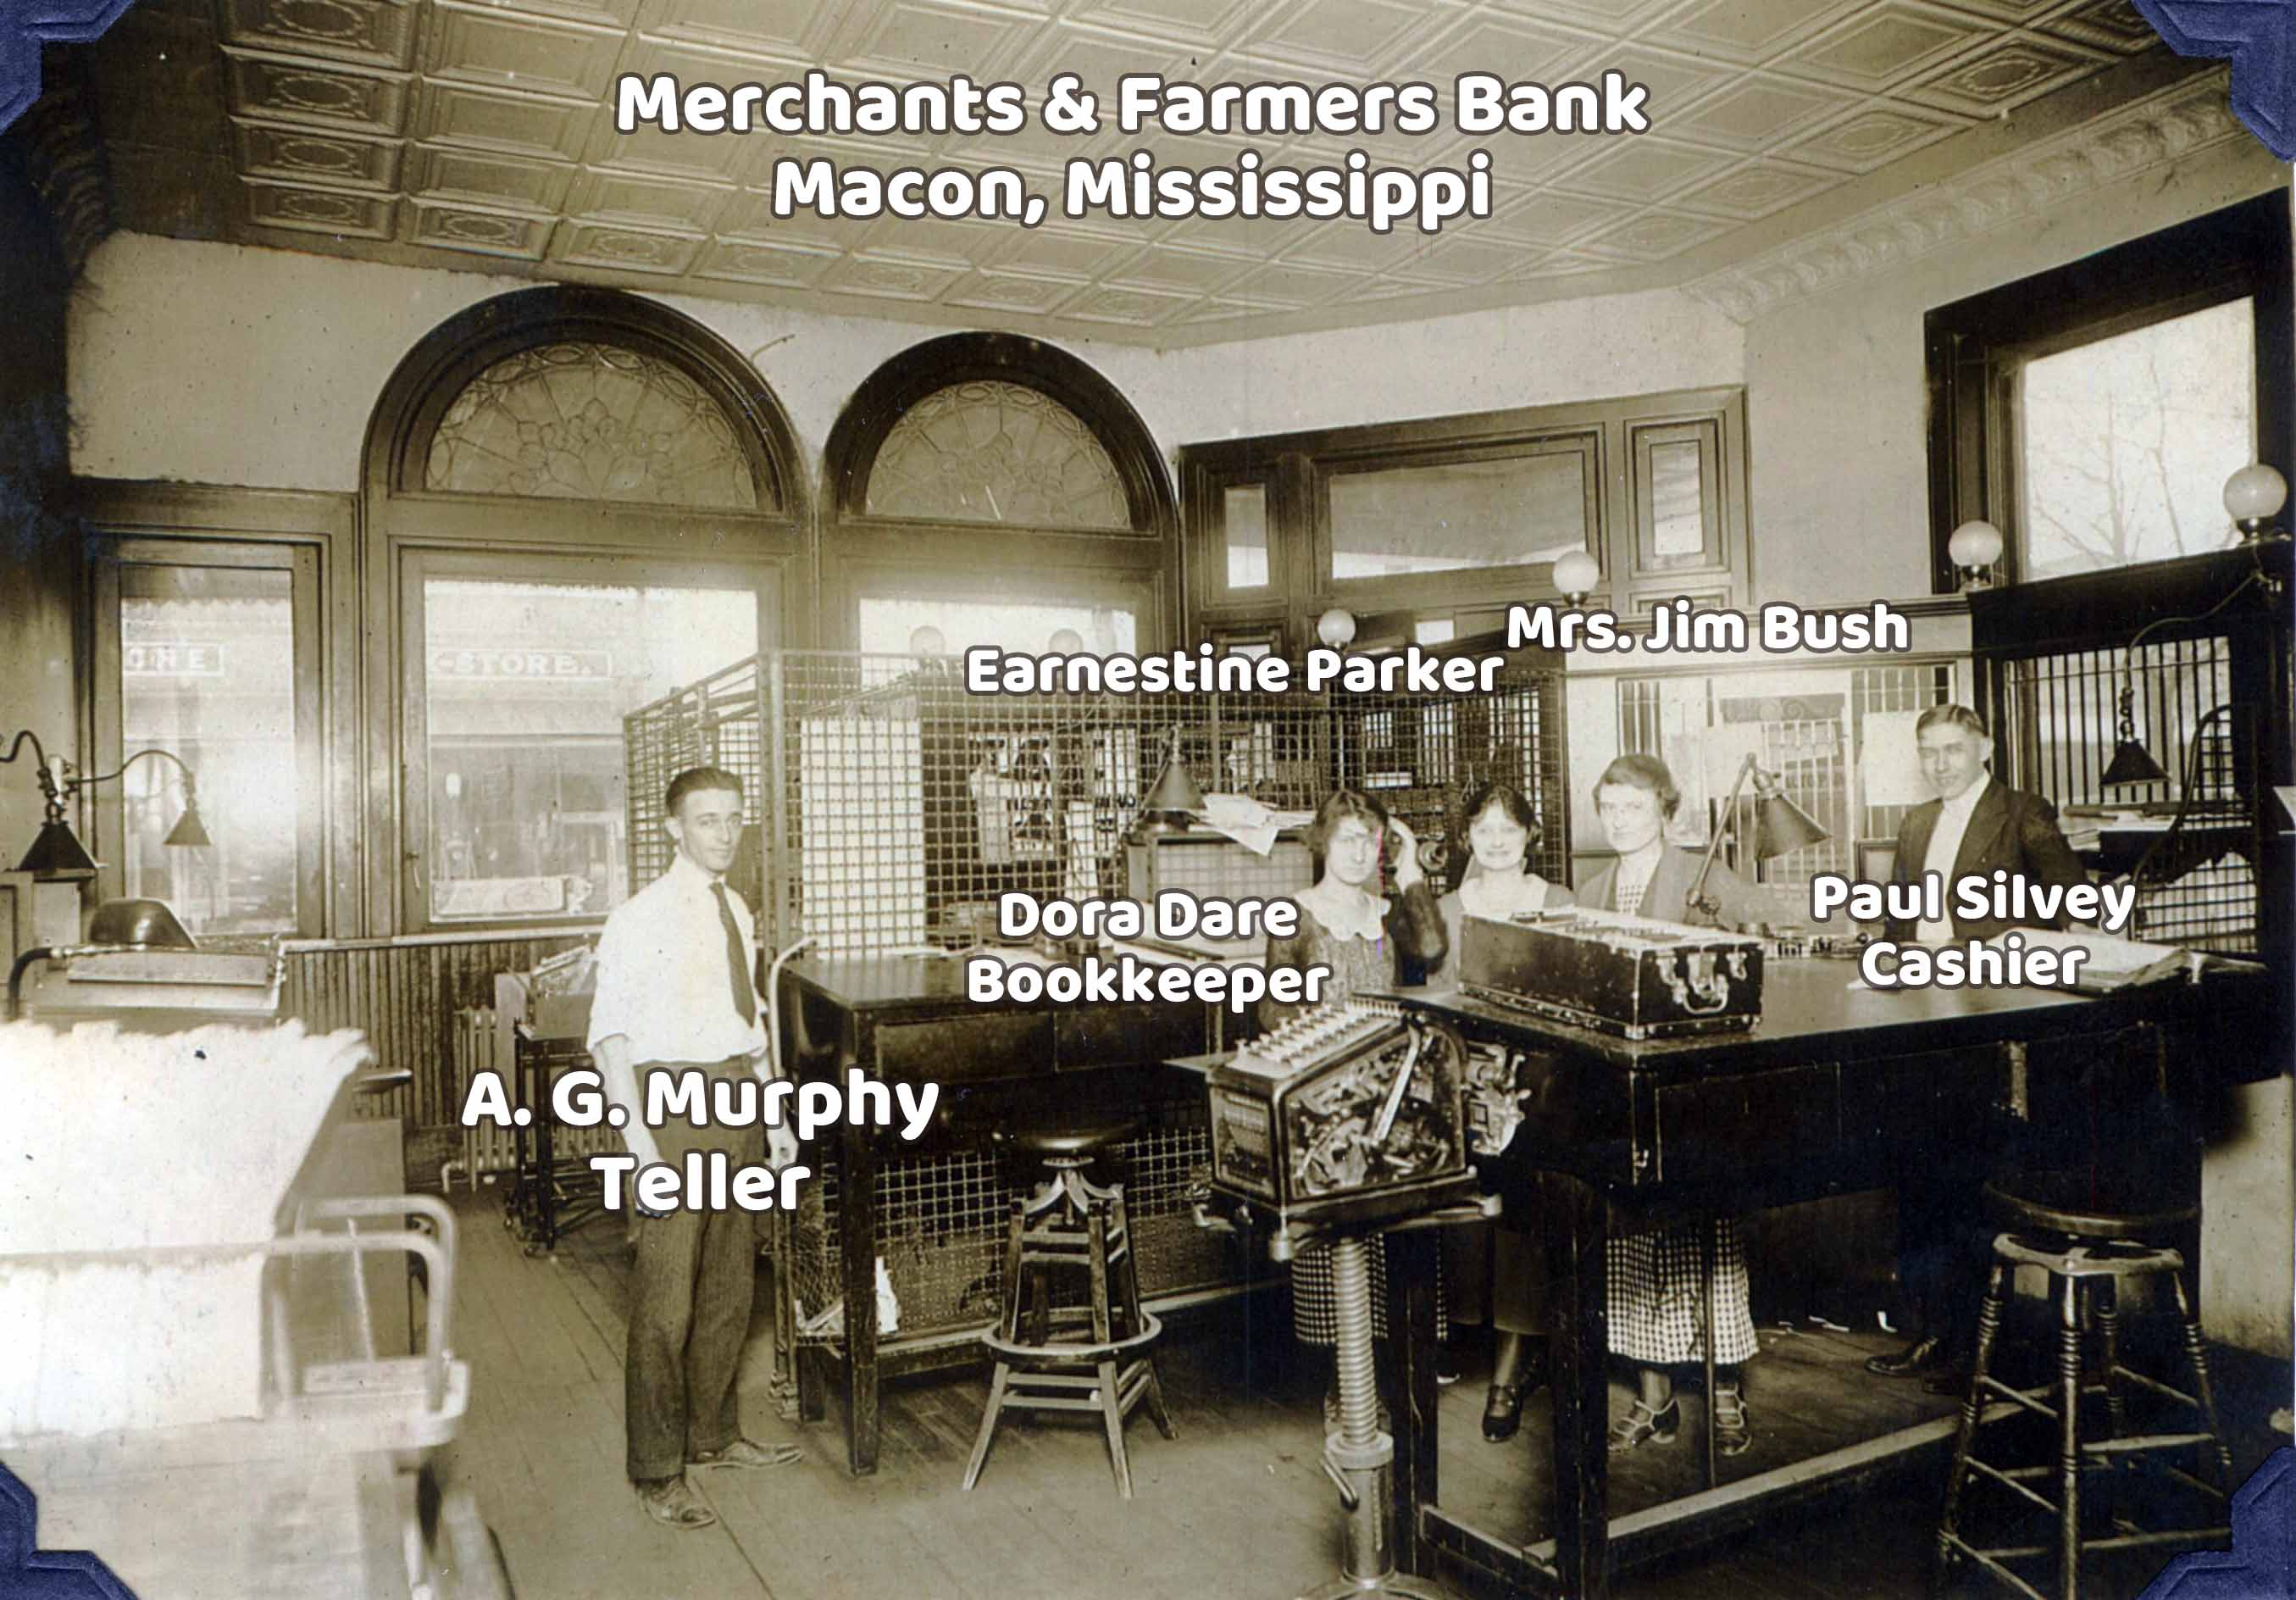 M&F Bank - Macon, Mississippi